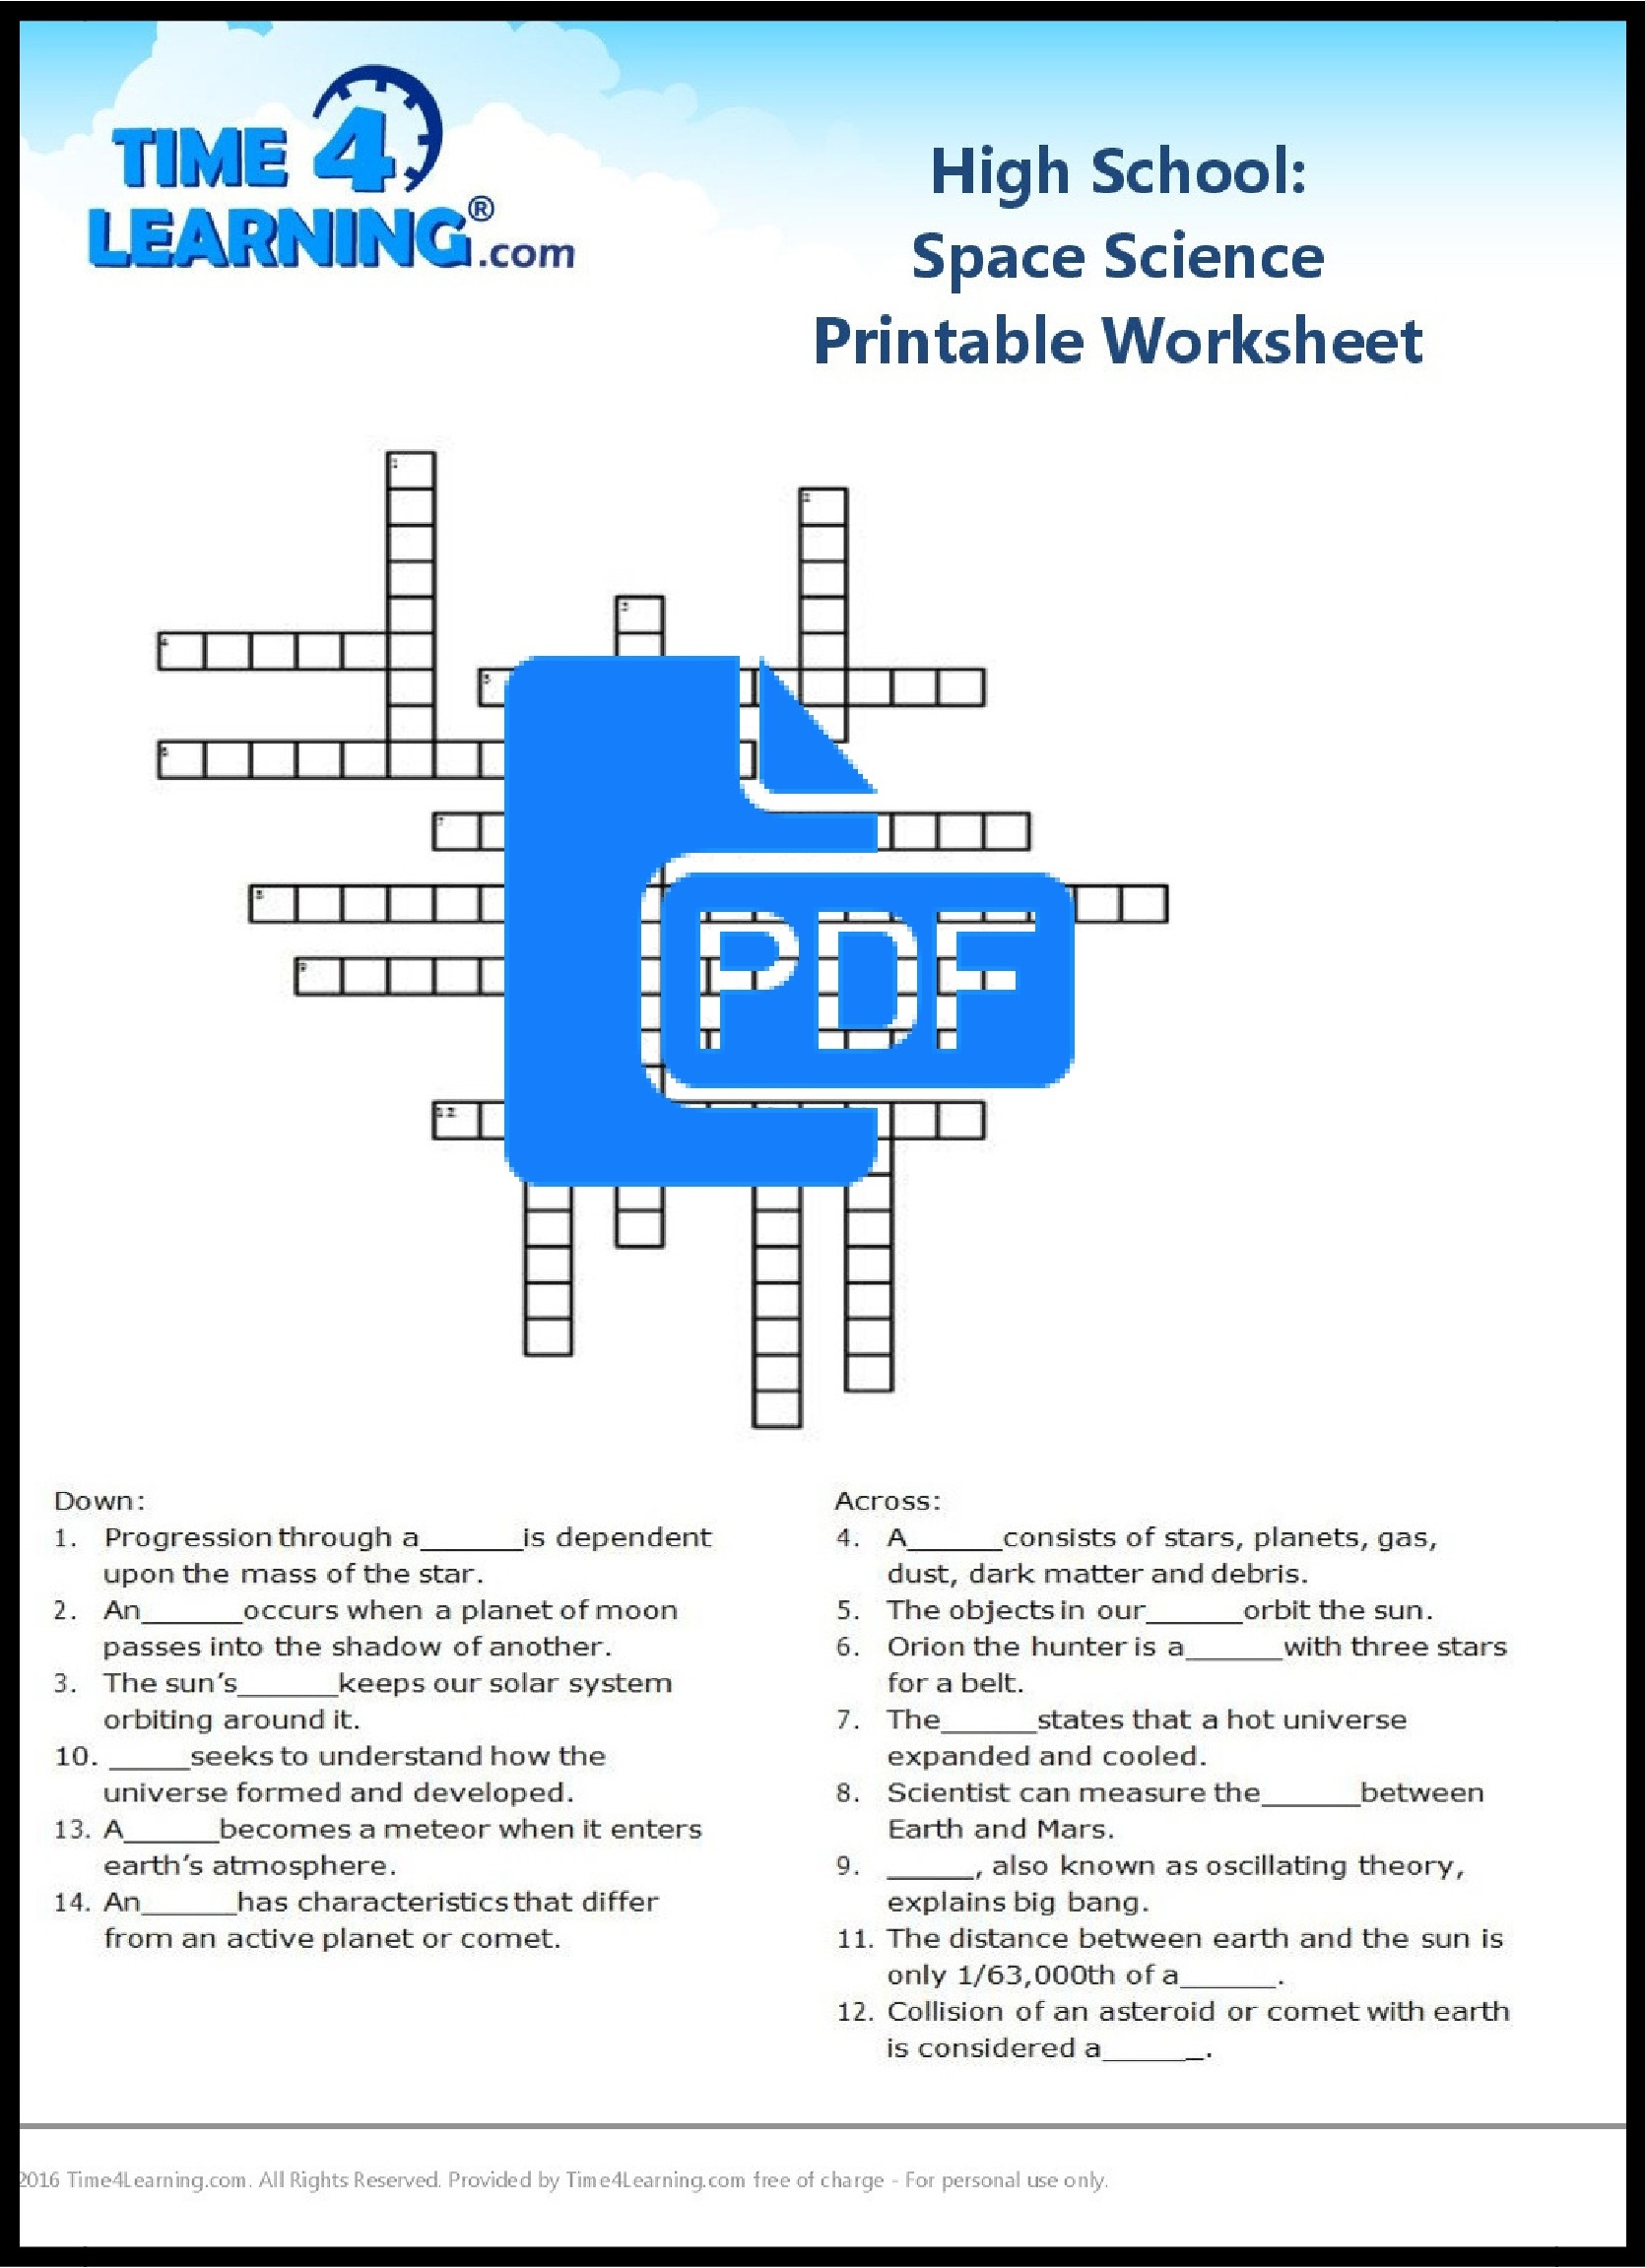 Free Printable: High School Space Science Worksheet   Time4Learning - 9Th Grade Science Worksheets Free Printable